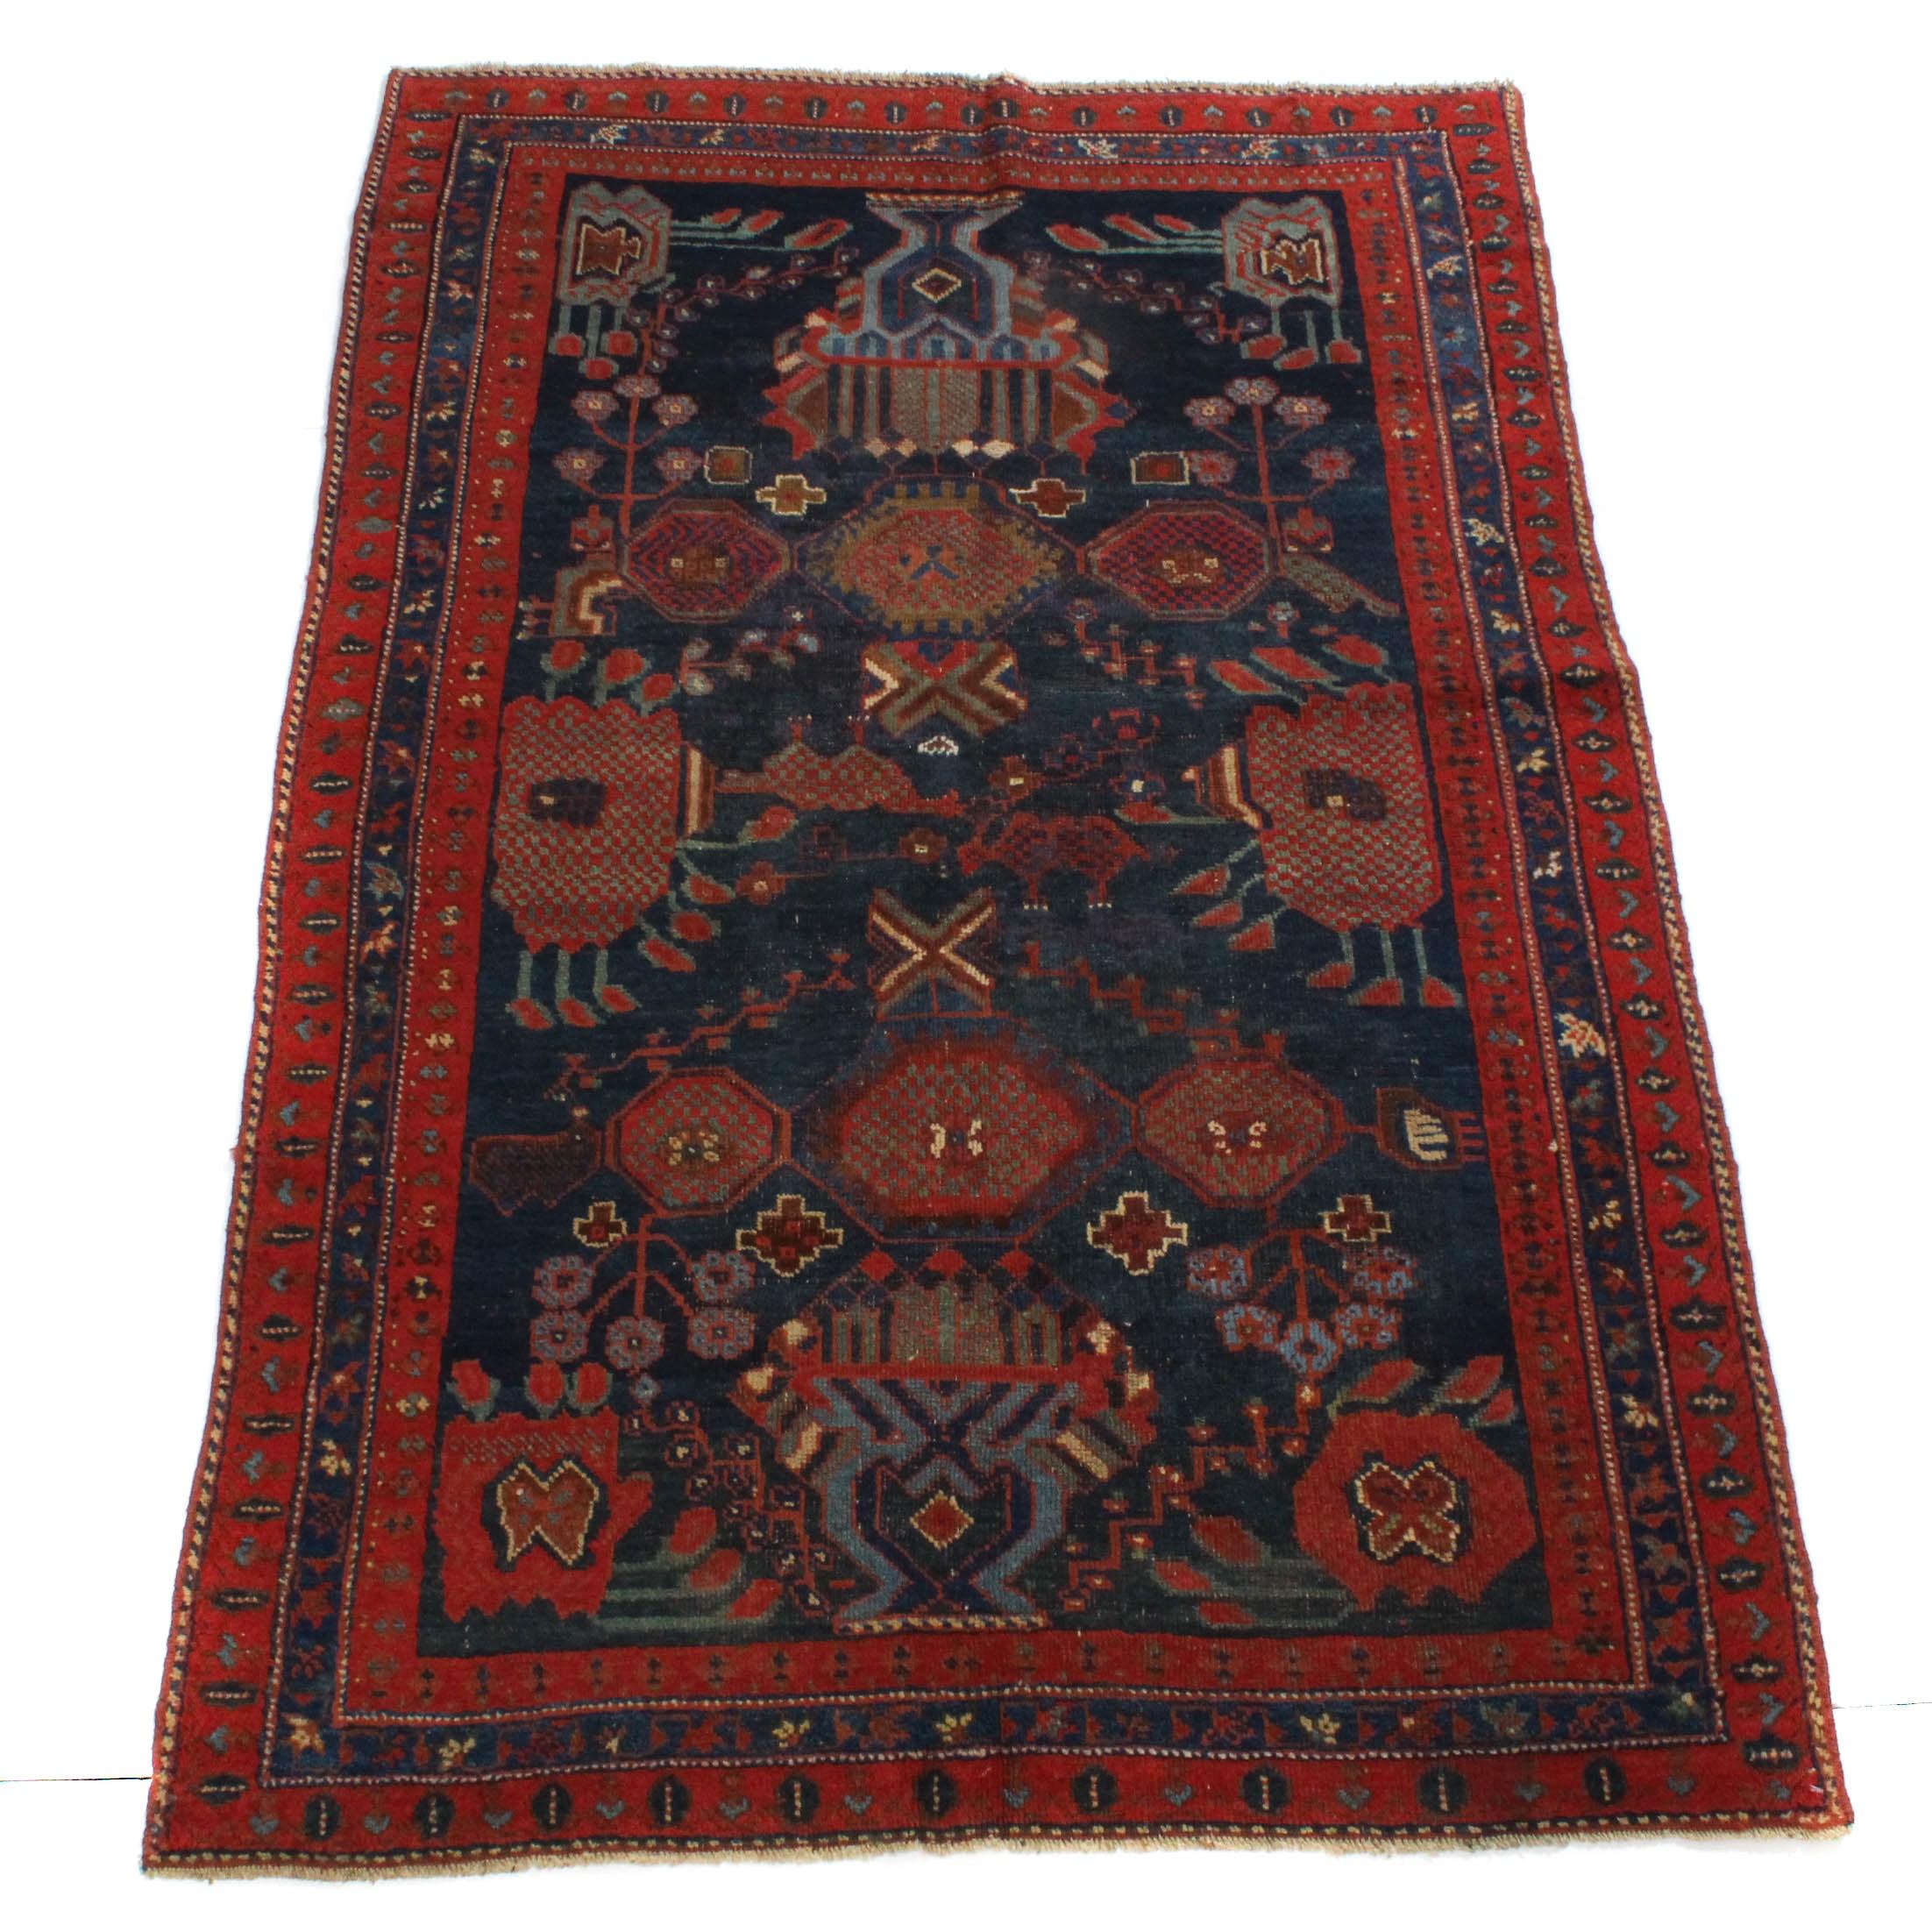 3'7 x 5'10 Antique Hand-Knotted Persian Kurdish Caucasian Rug